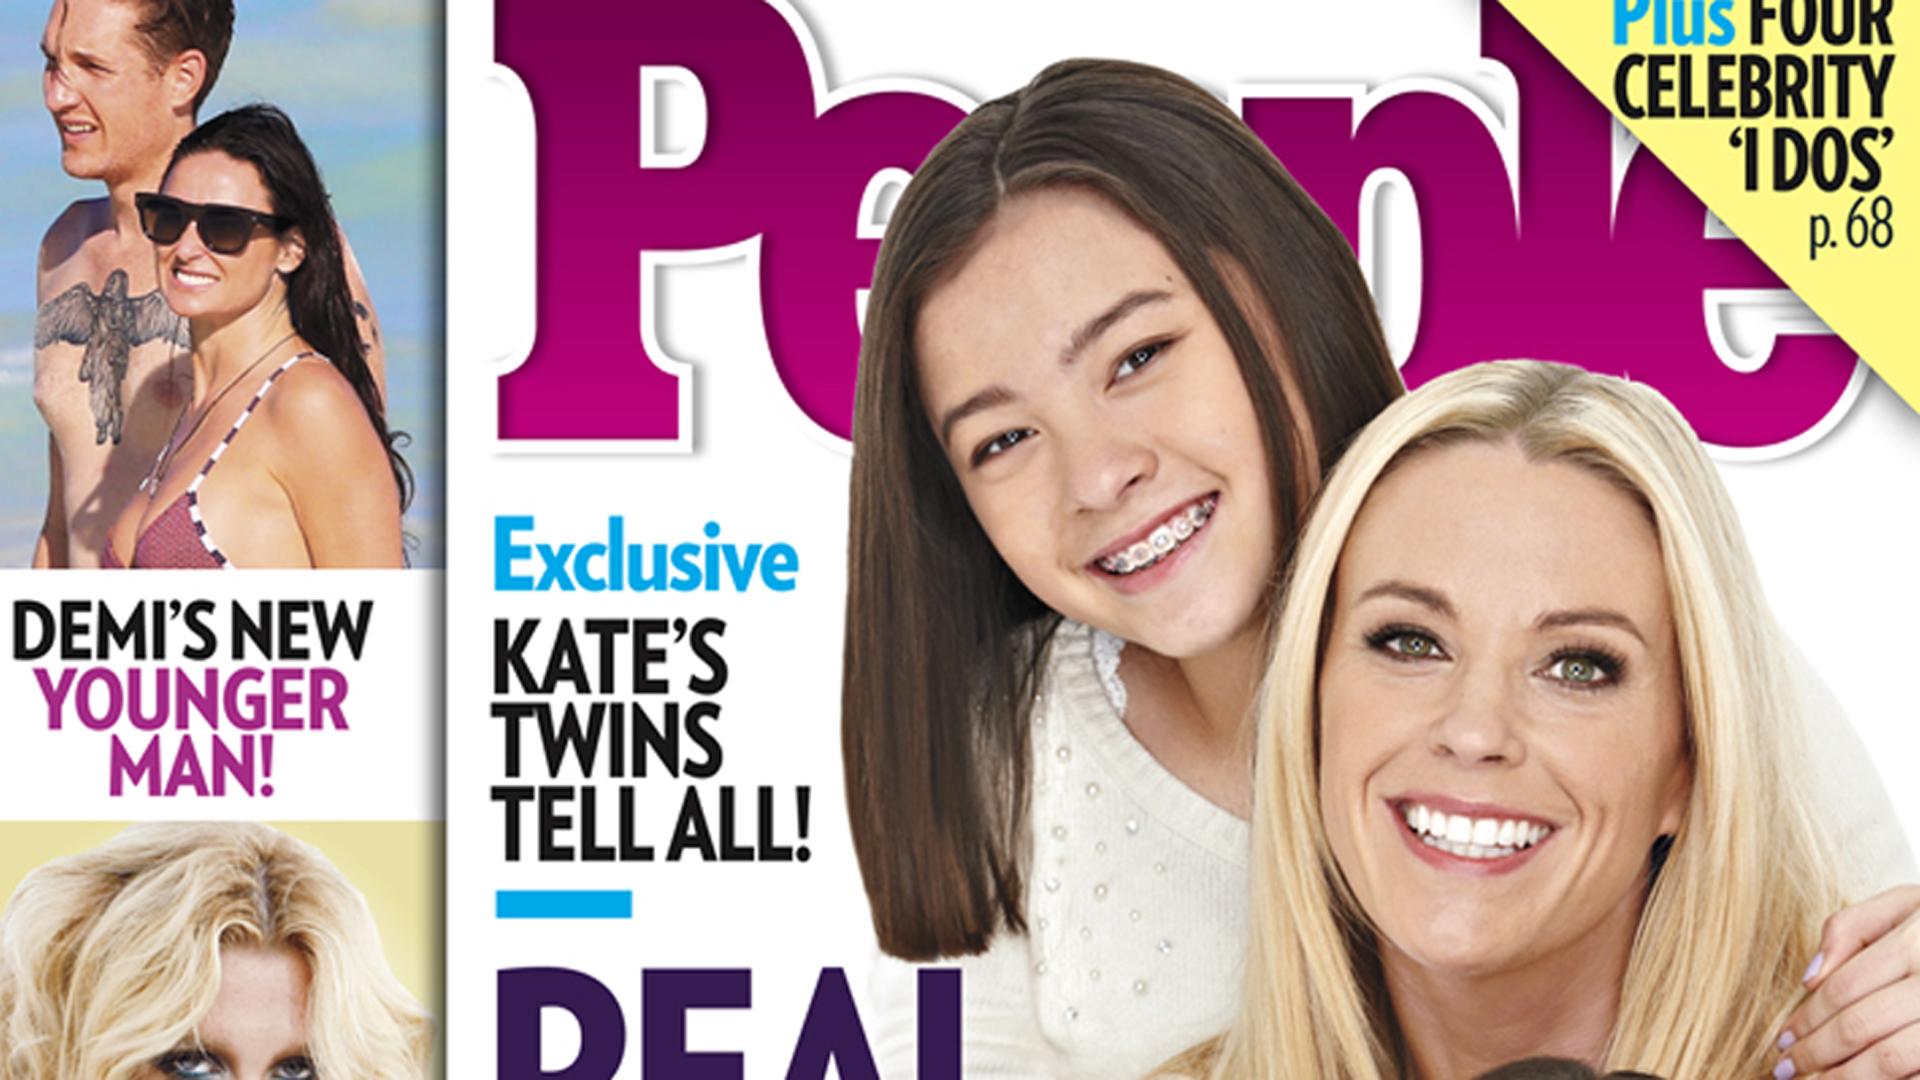 Image: Mady, Kate and Cara Gosselin